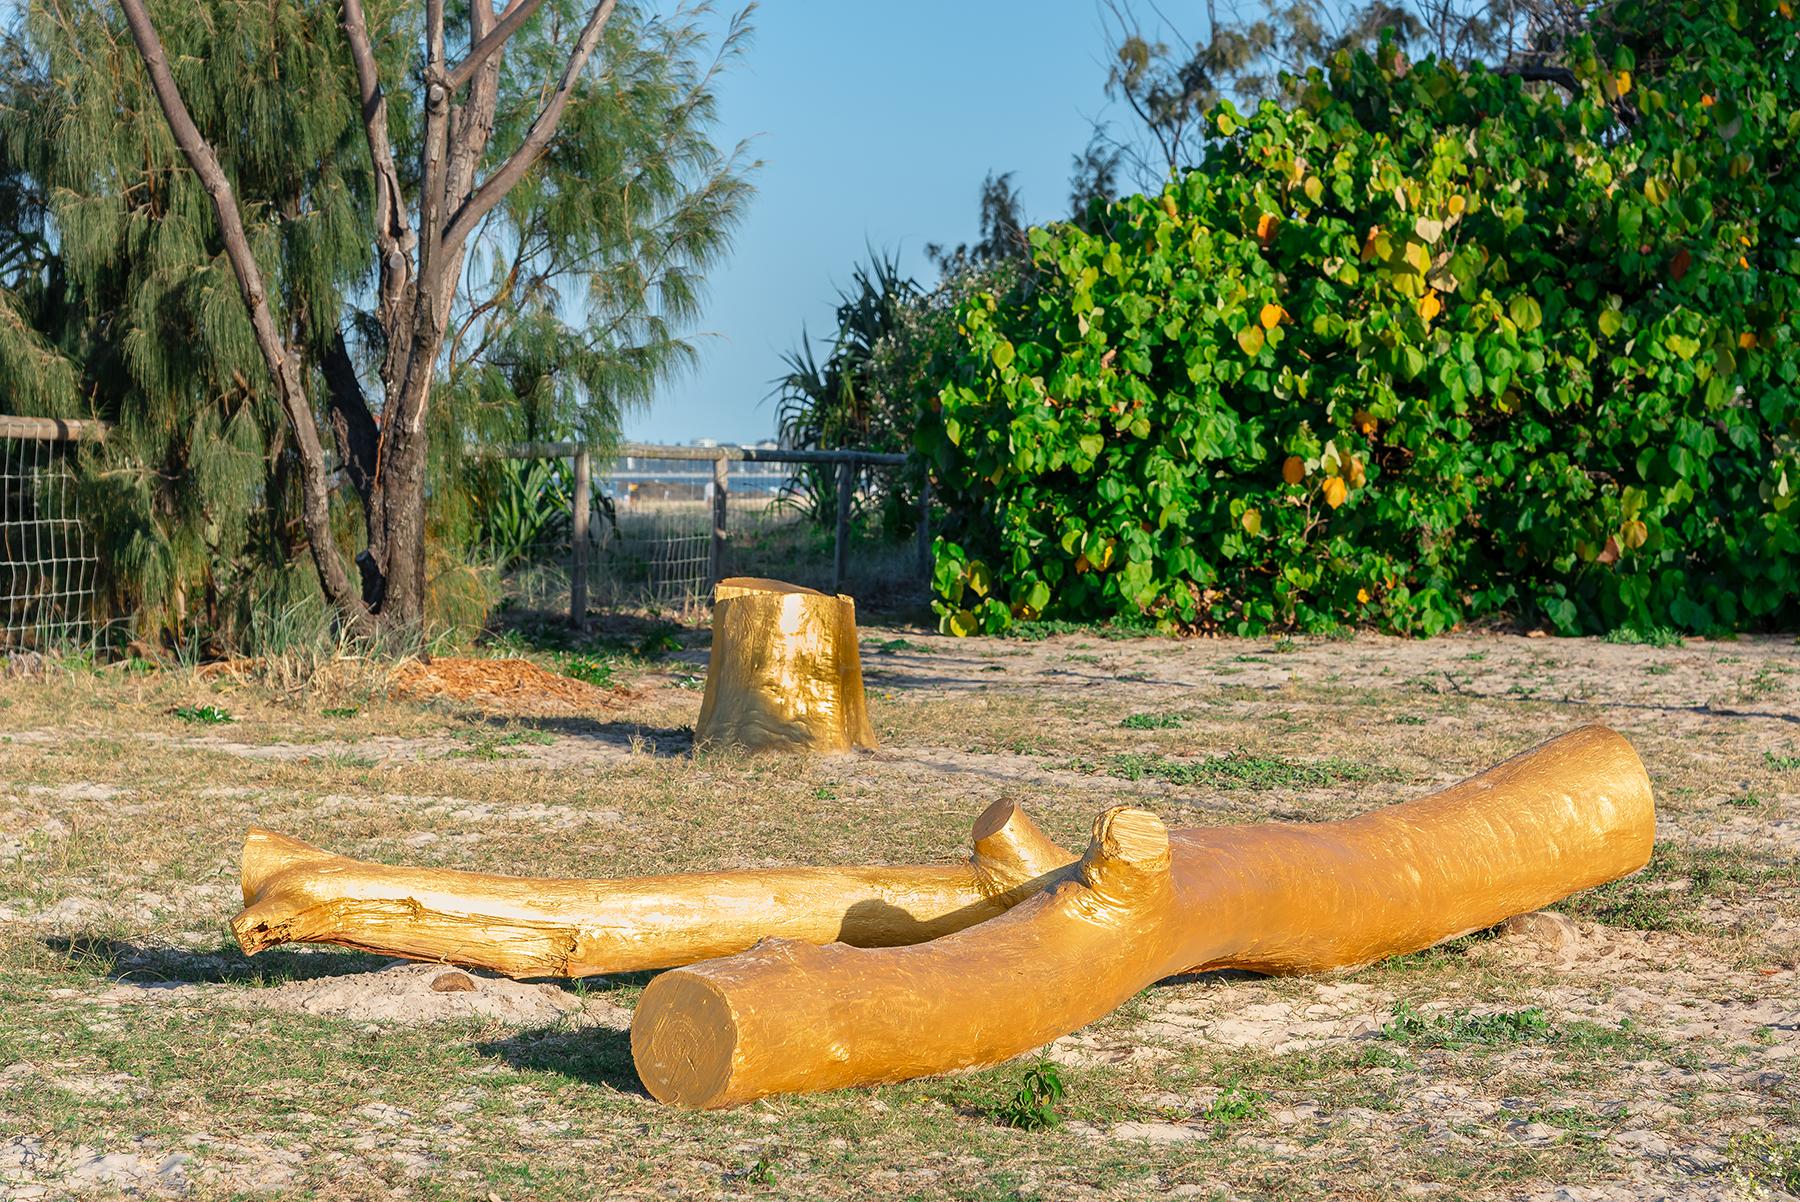 Karl Chilcott   Ngara Tree   Photography PBR Images